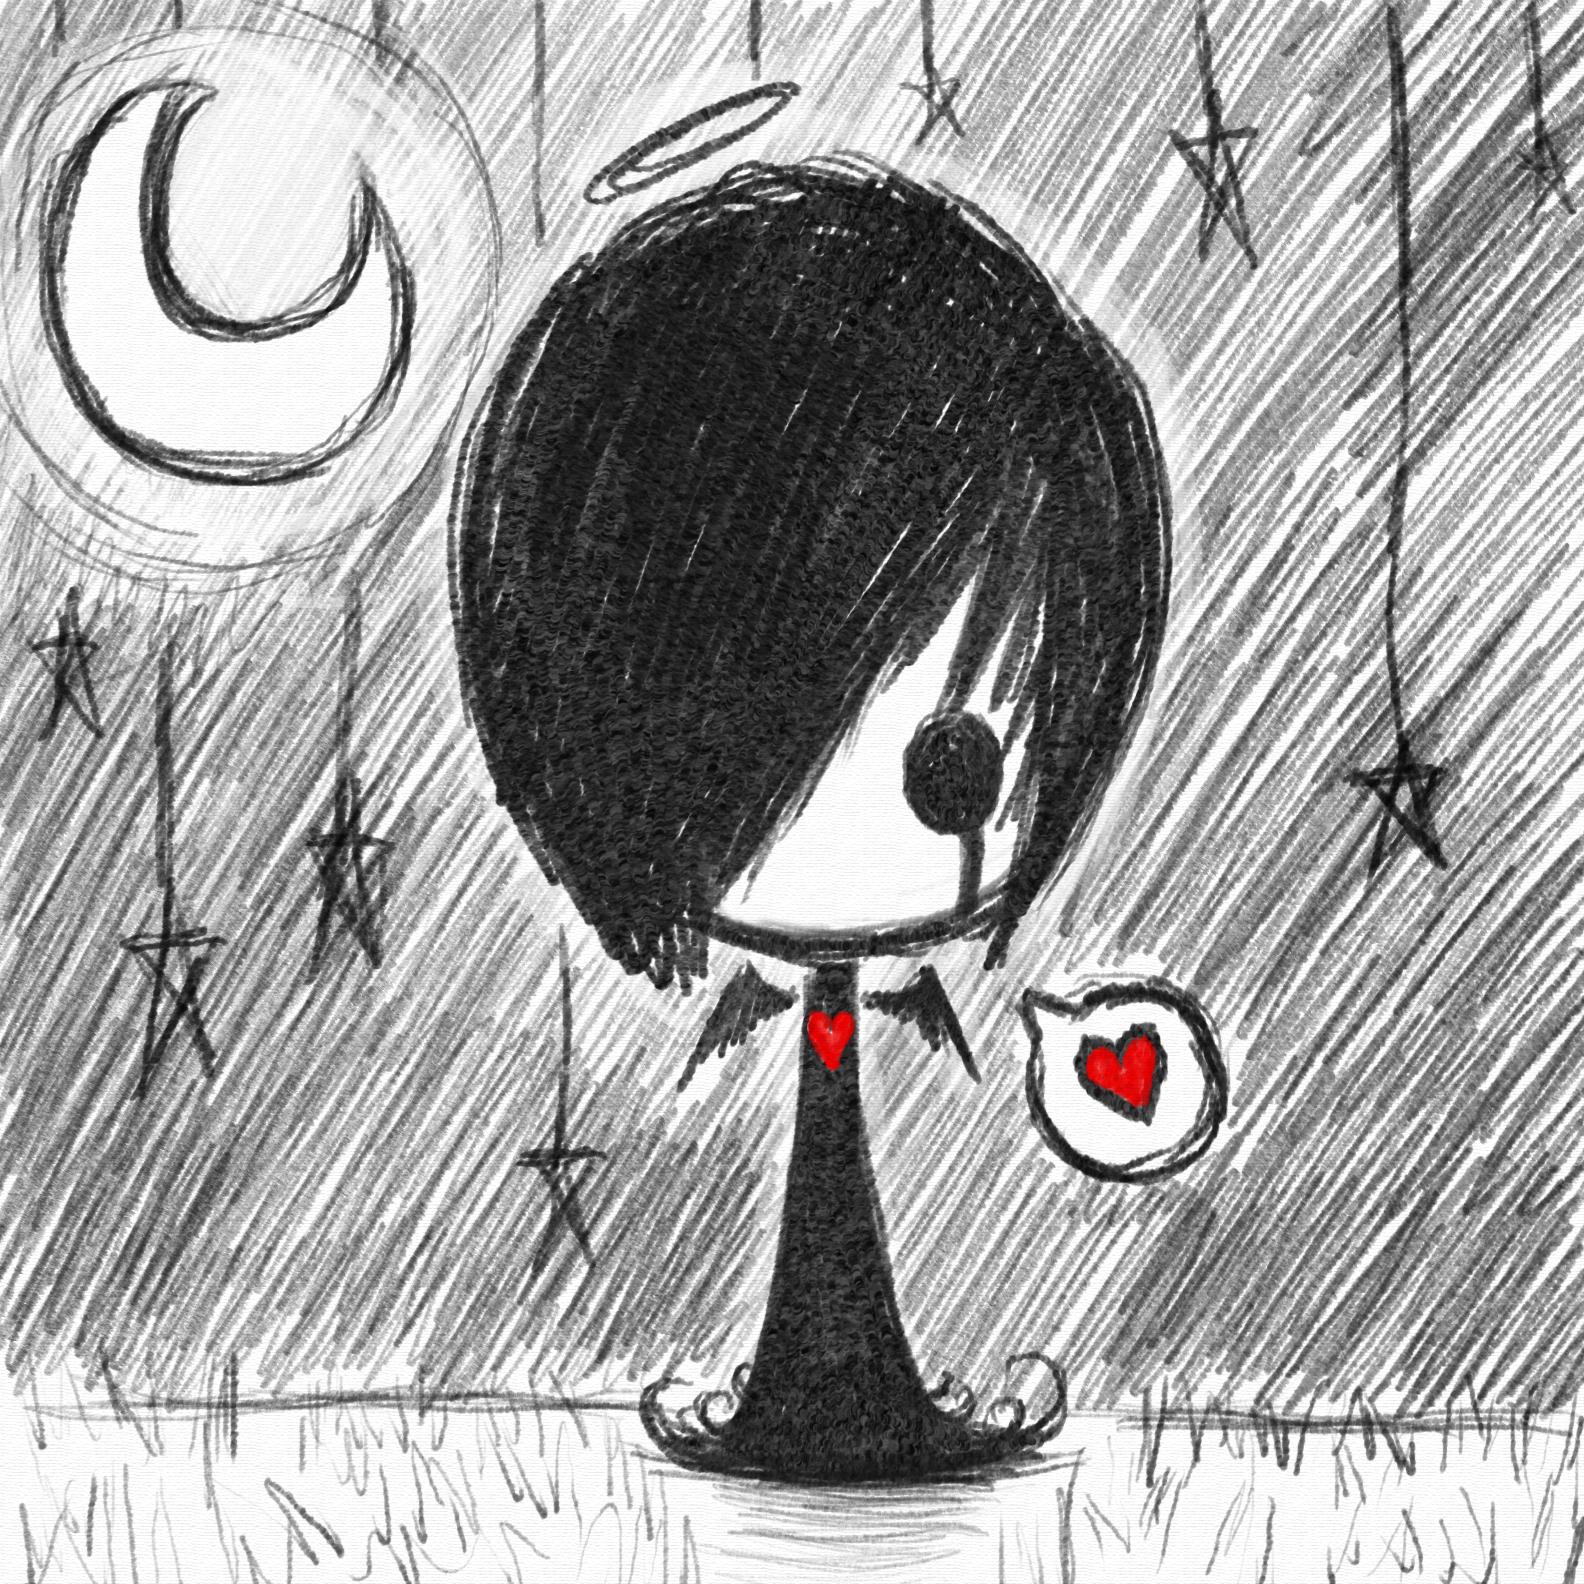 http://fc07.deviantart.net/fs47/f/2009/215/b/b/Emo_Sketch_by_mg9990